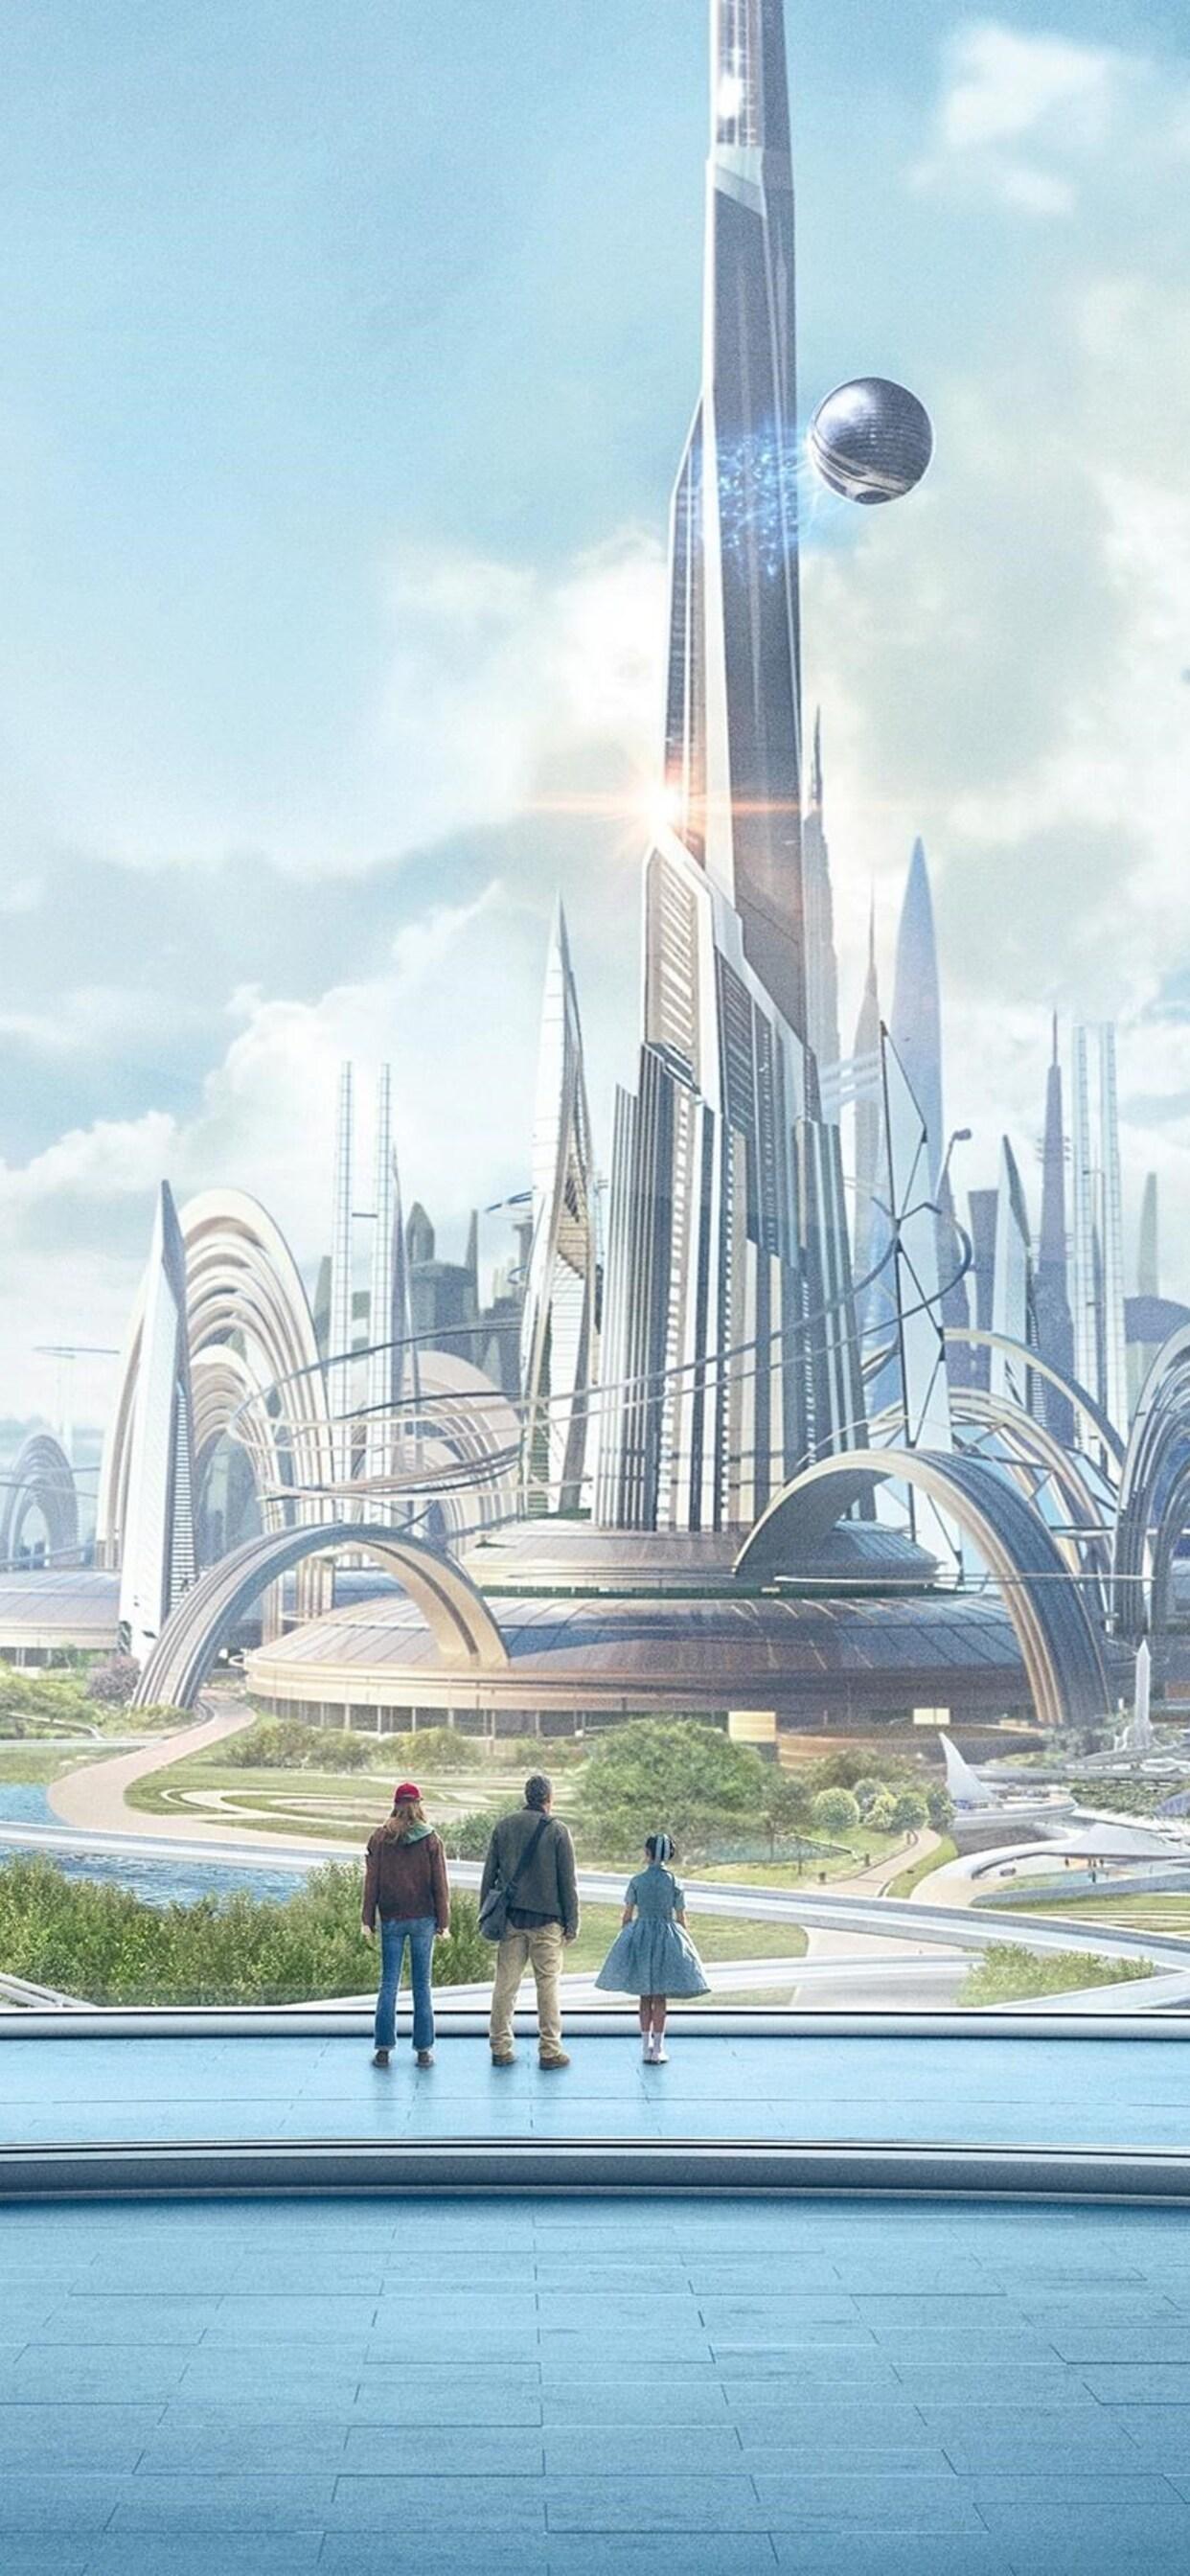 1242x2688 Tomorrowland Movie Iphone Xs Max Hd 4k Wallpapers